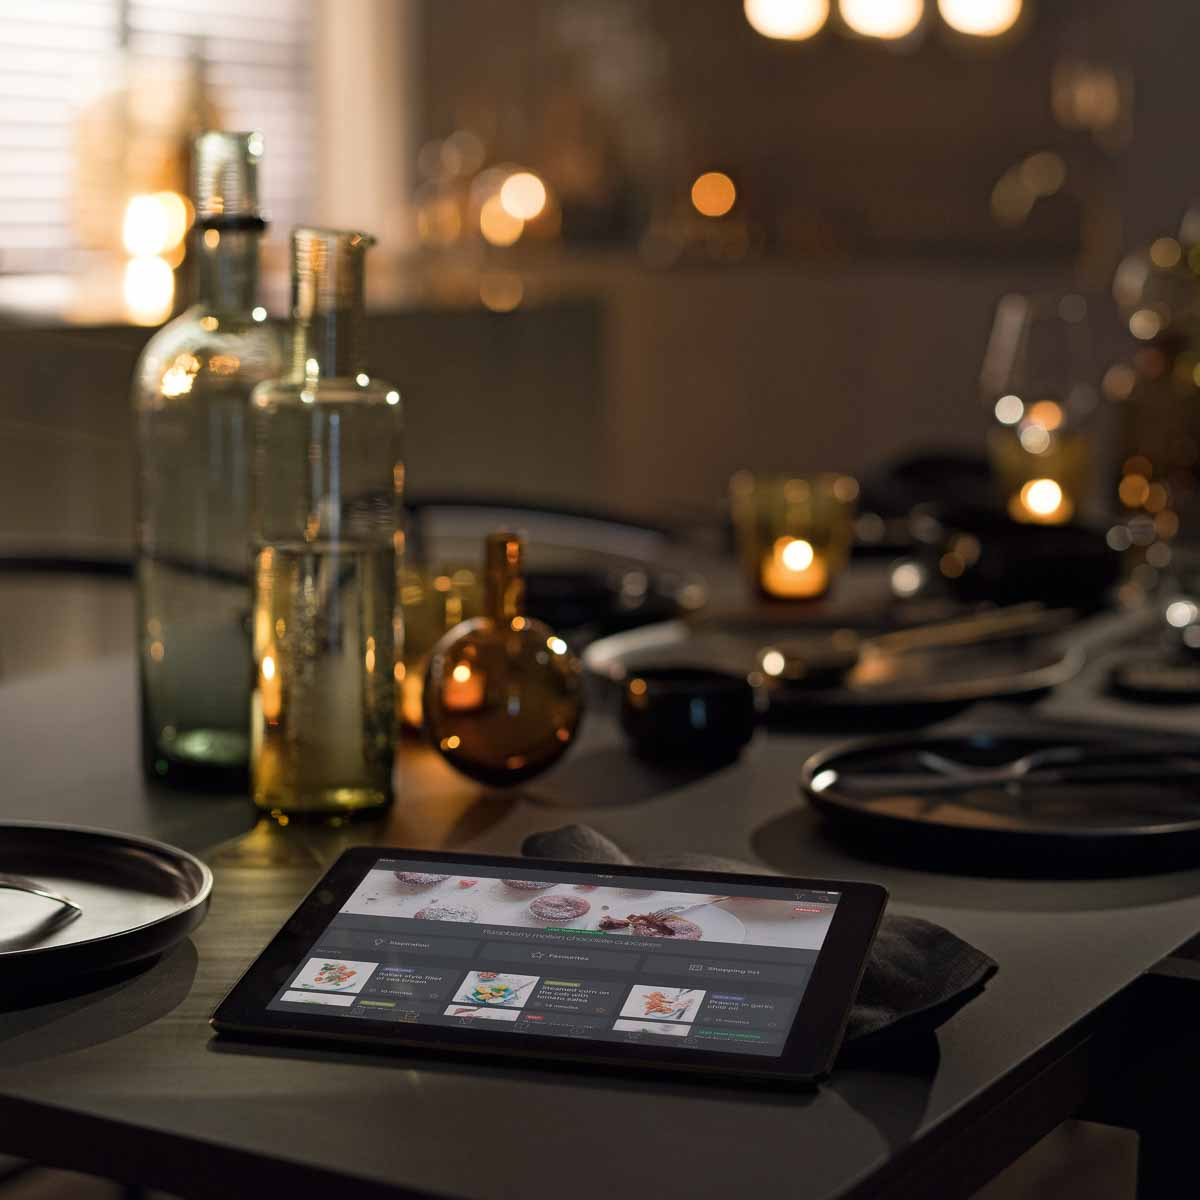 Miele Dialoggarer mit dem iPad programmieren